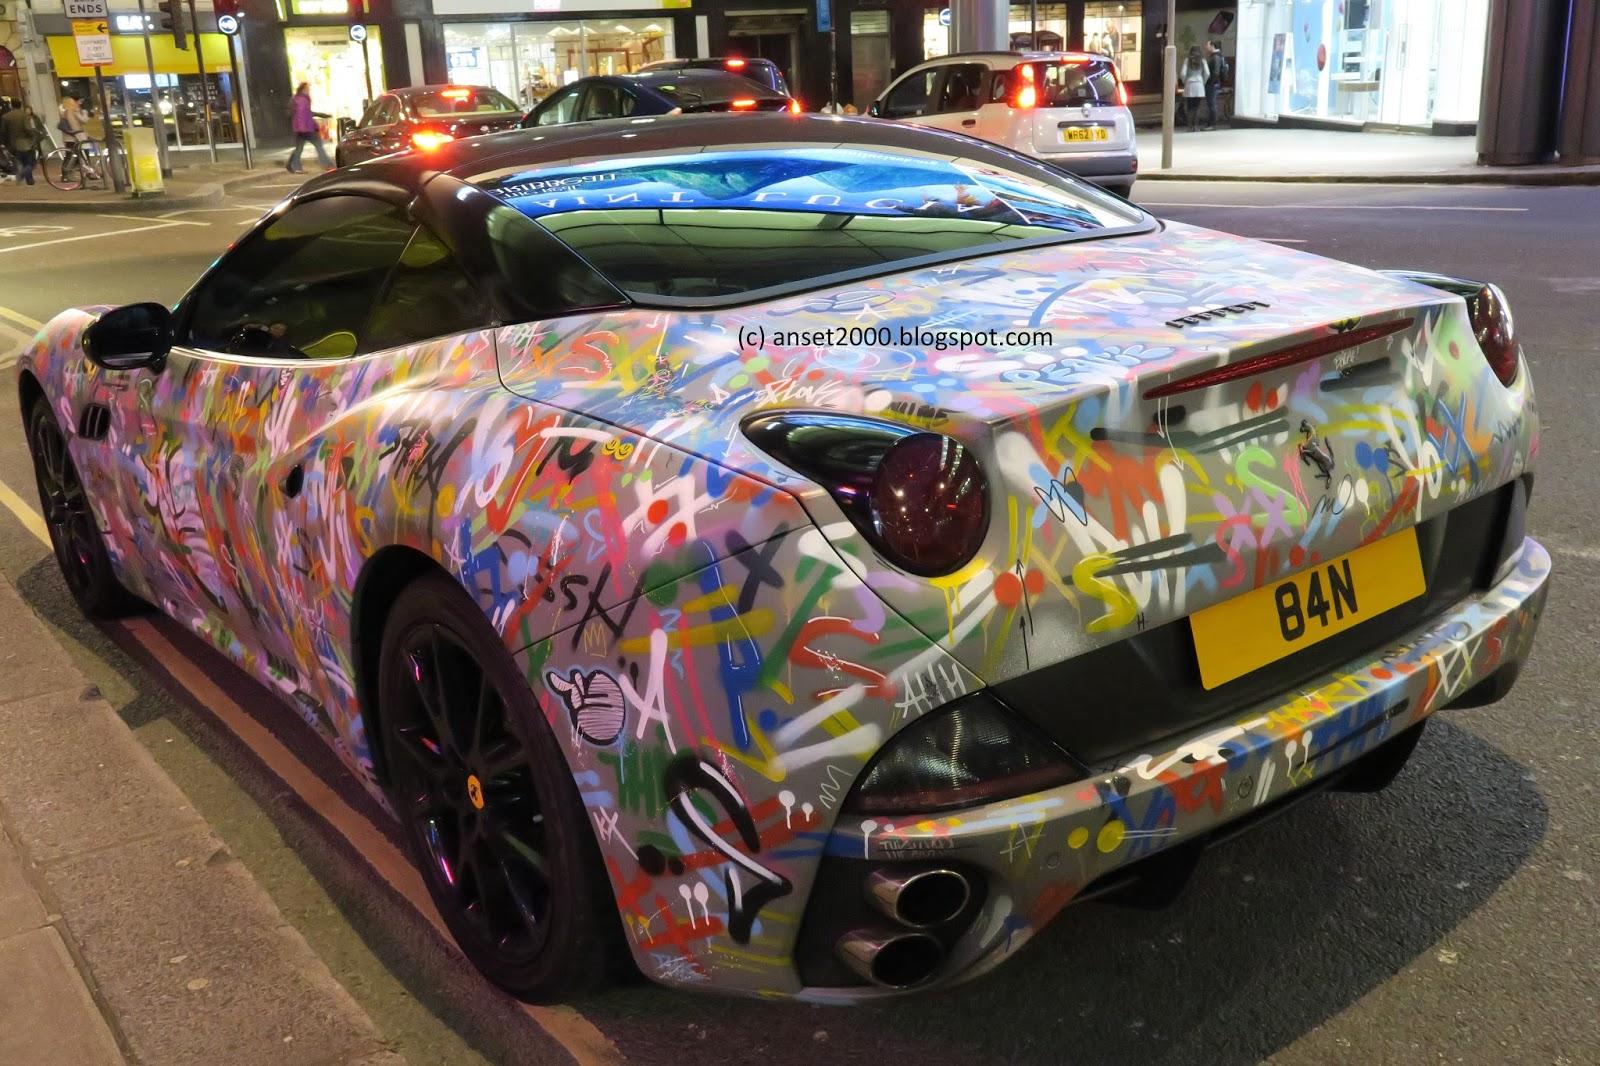 Ferrari California With Graffiti Wrap Seen In London Anset2000 Blog